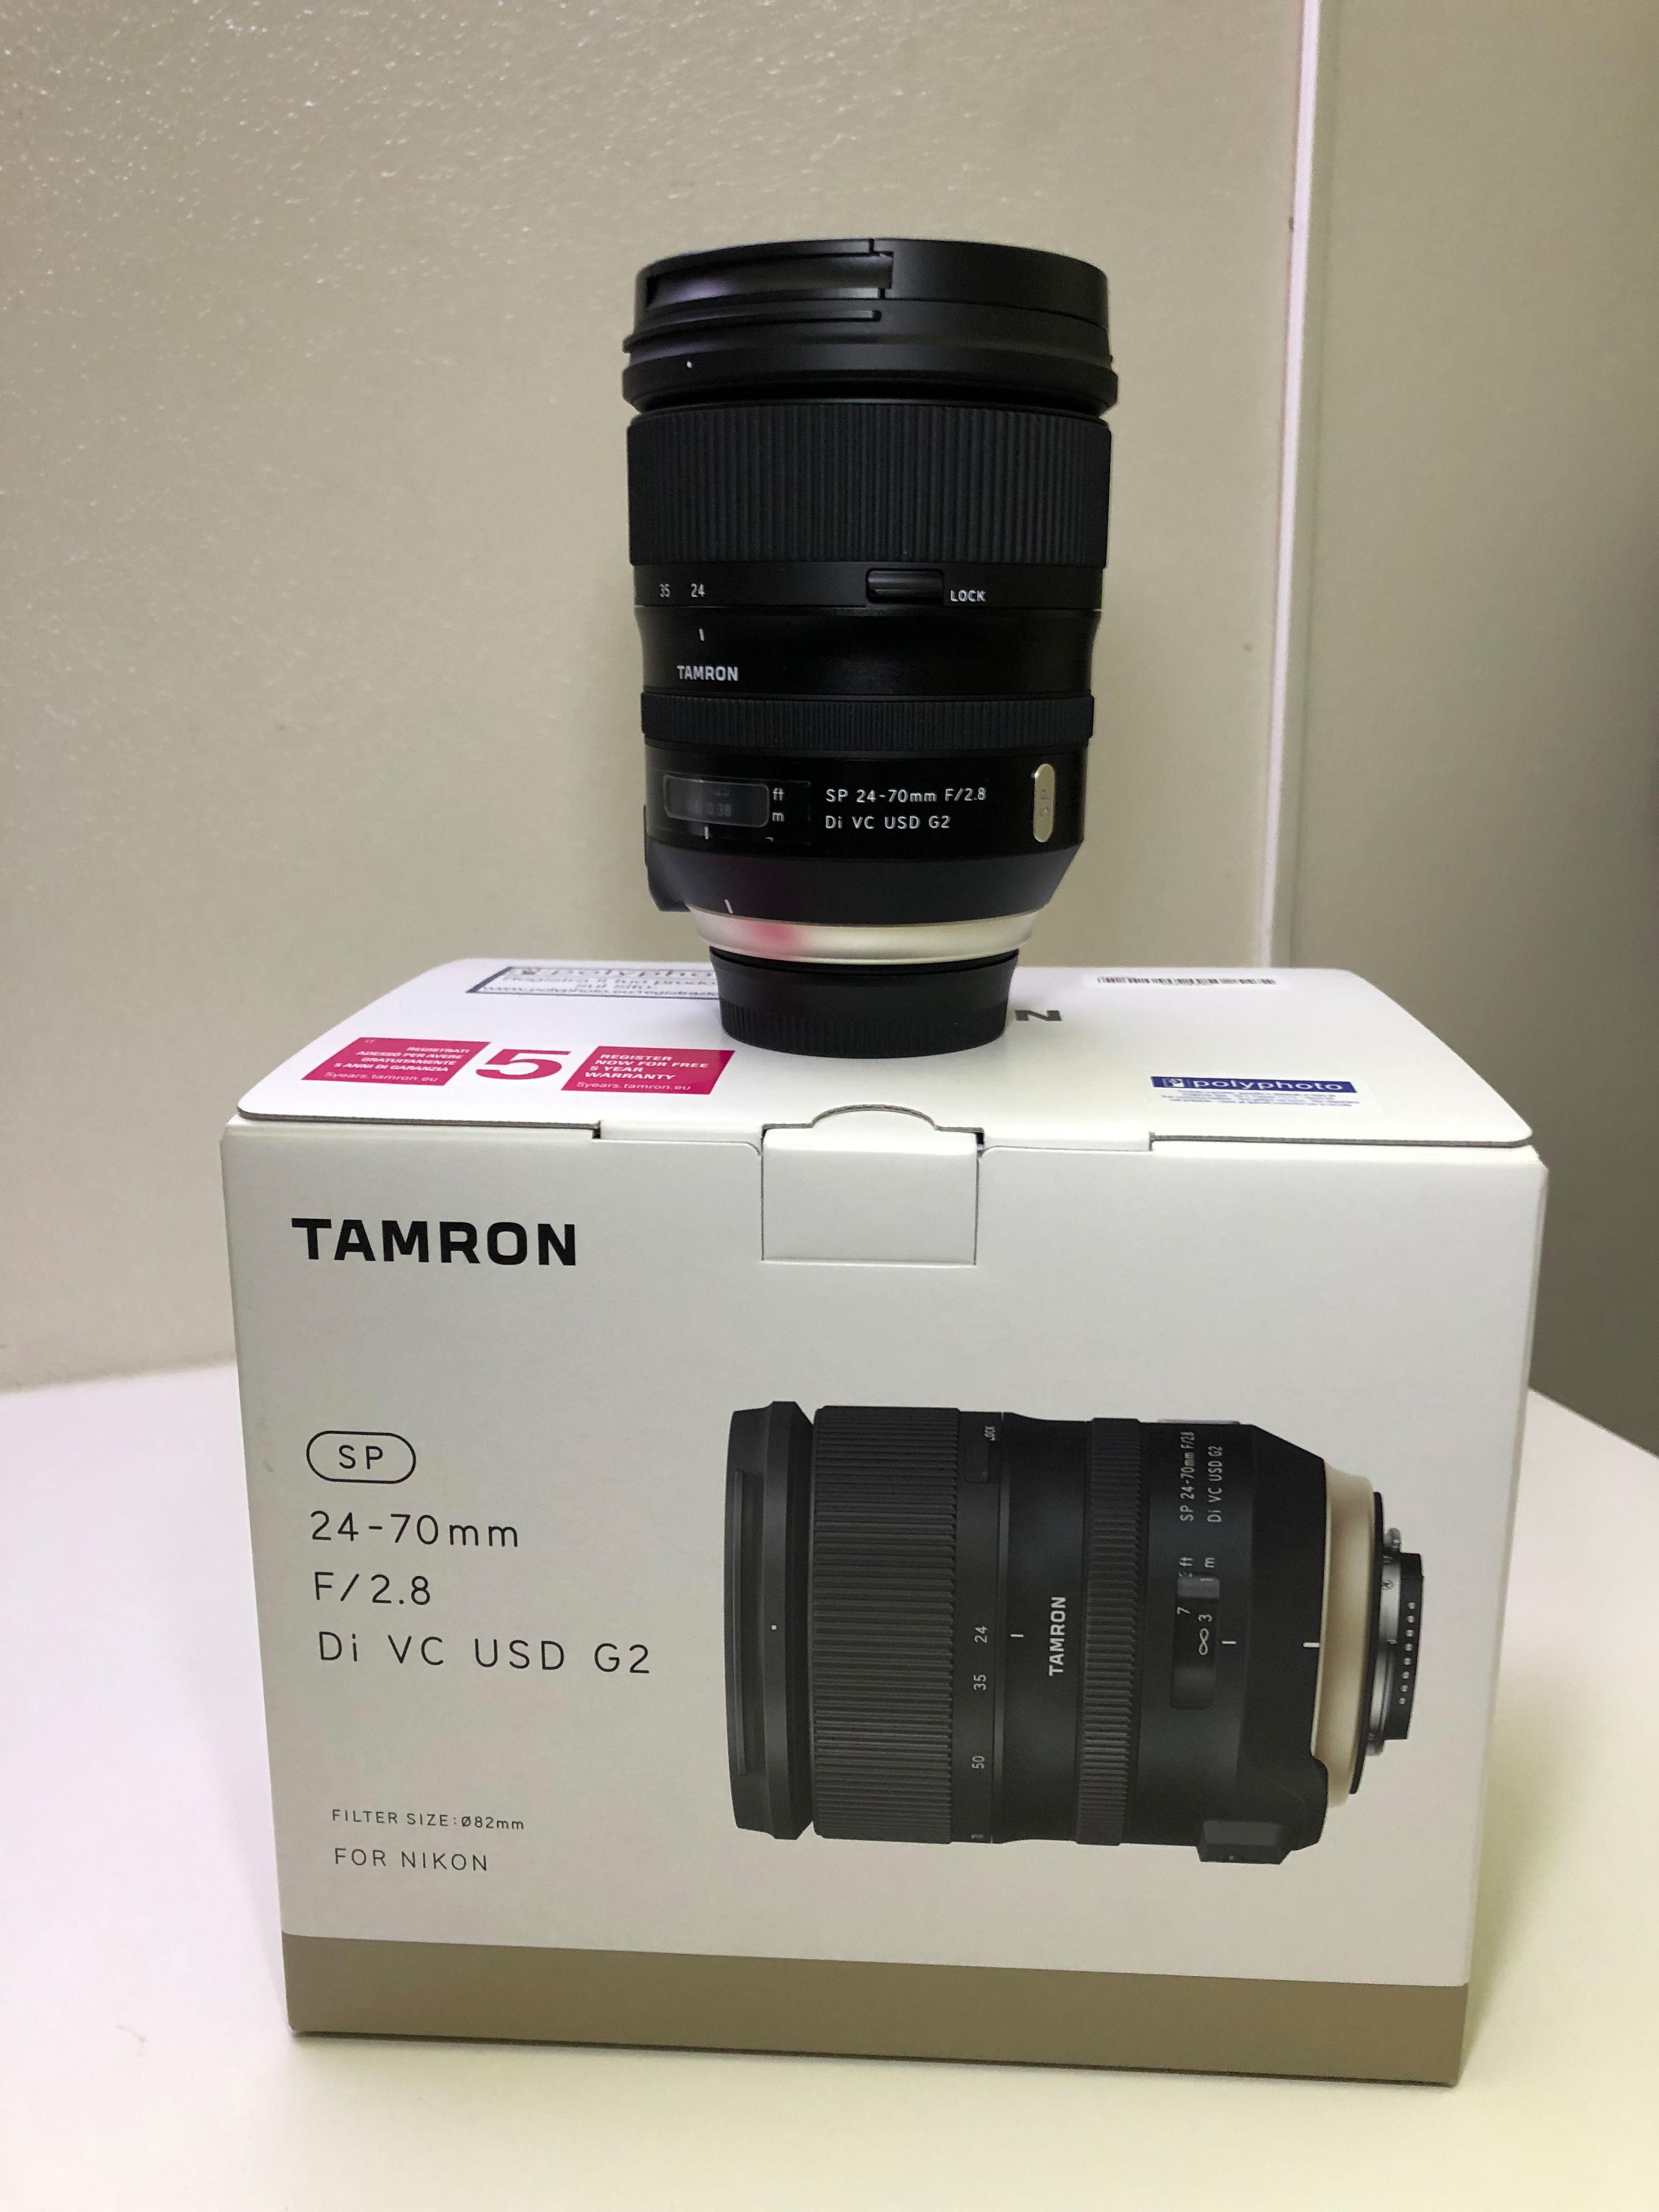 SP 24-70mm f/2.8 Di VC USD G2 Nikon